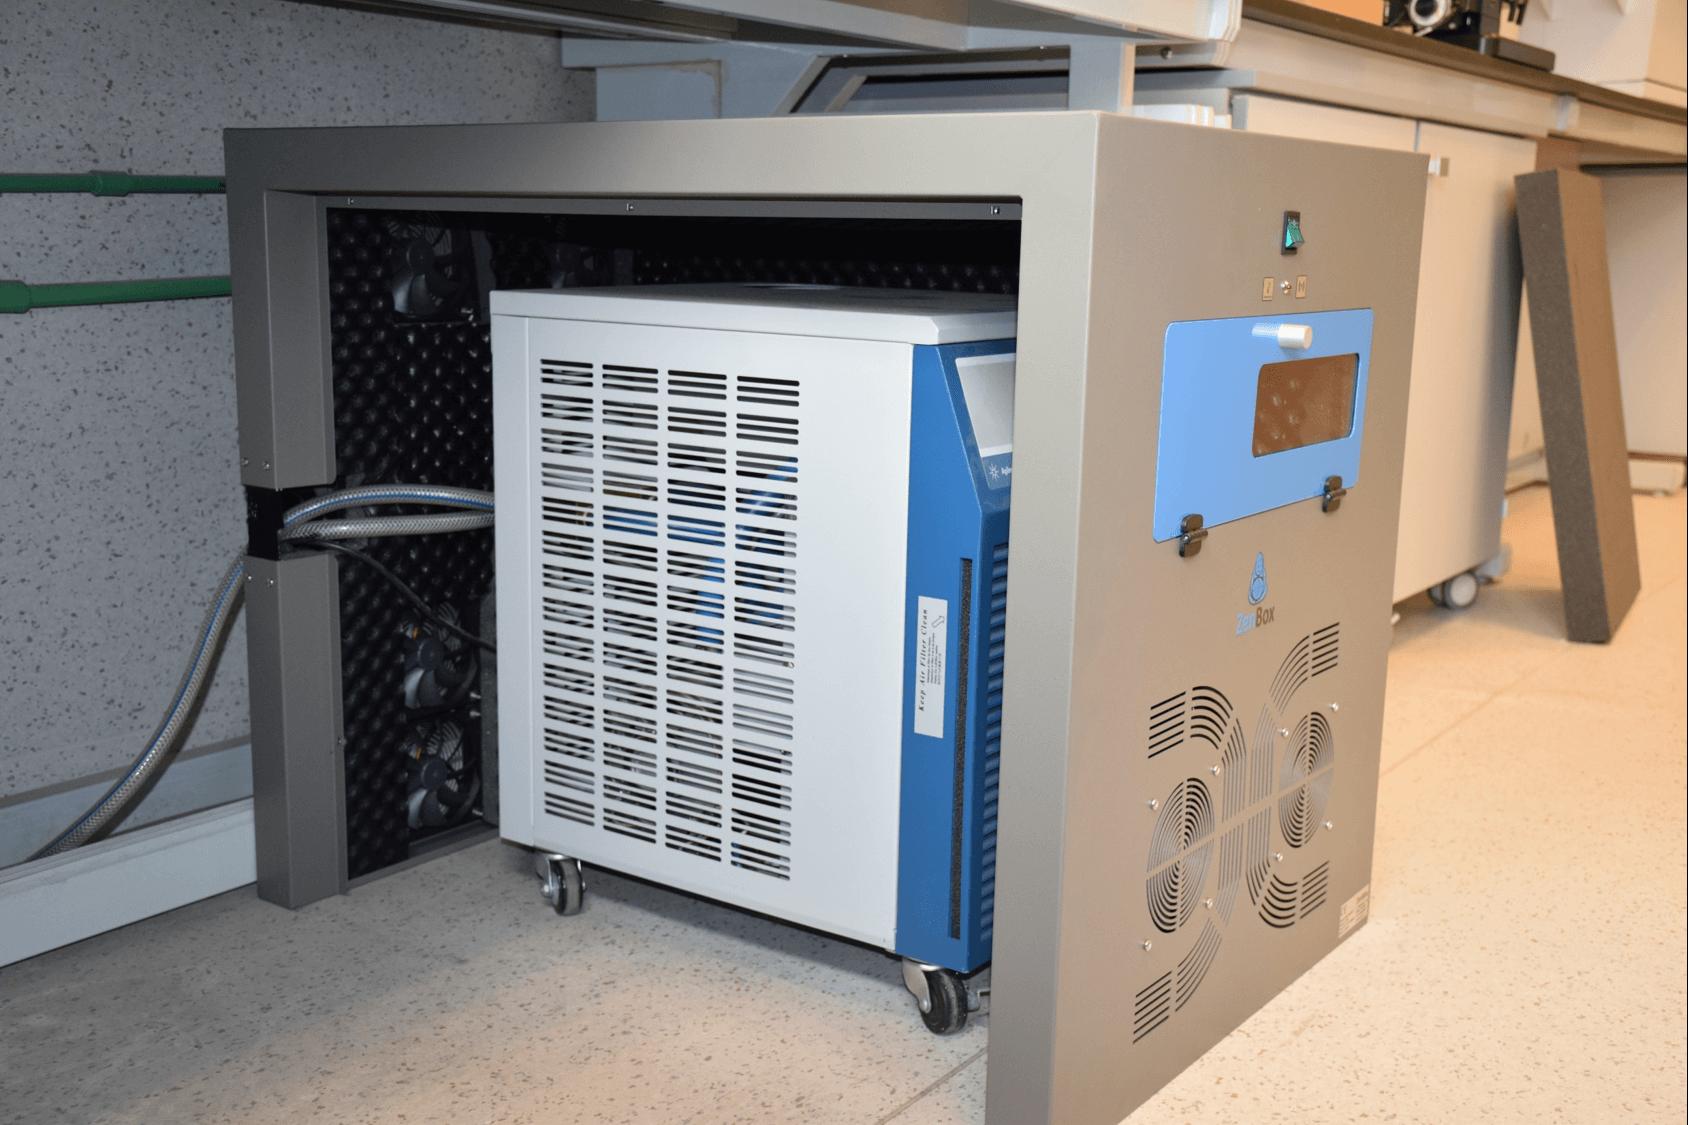 noise reduction enclosure for one agilent G1879b heat exchanger chiller